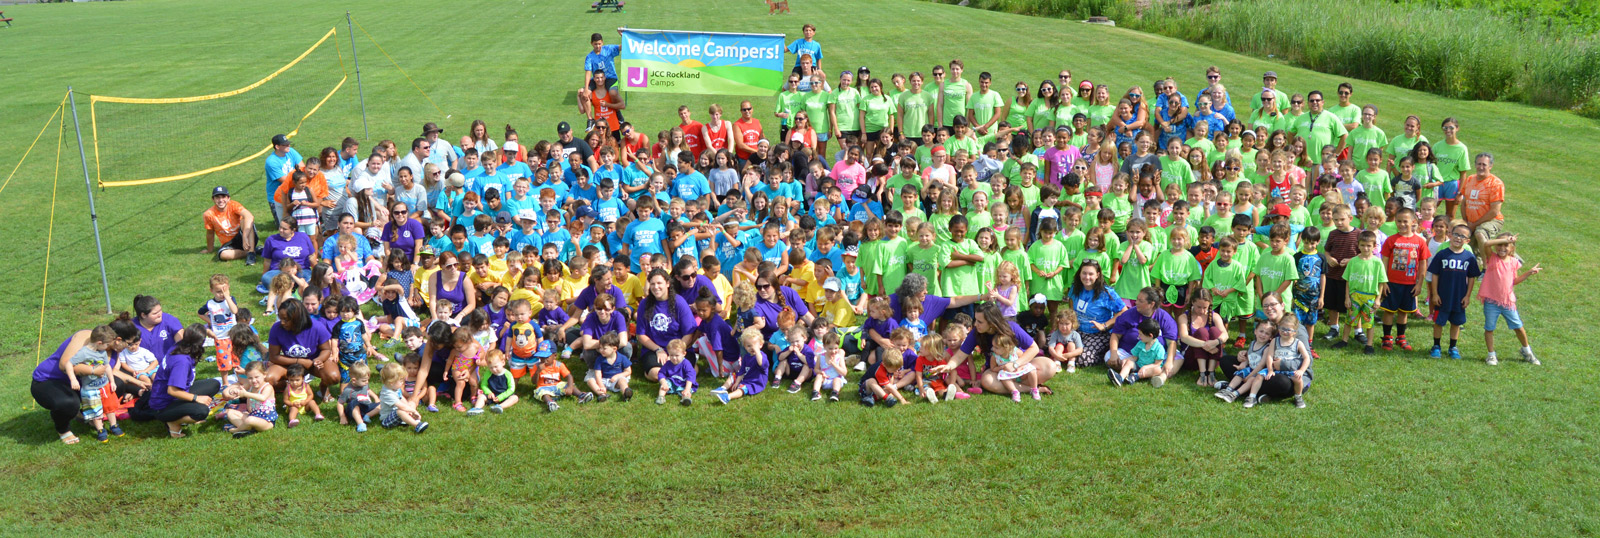 JCC Rockland Camps